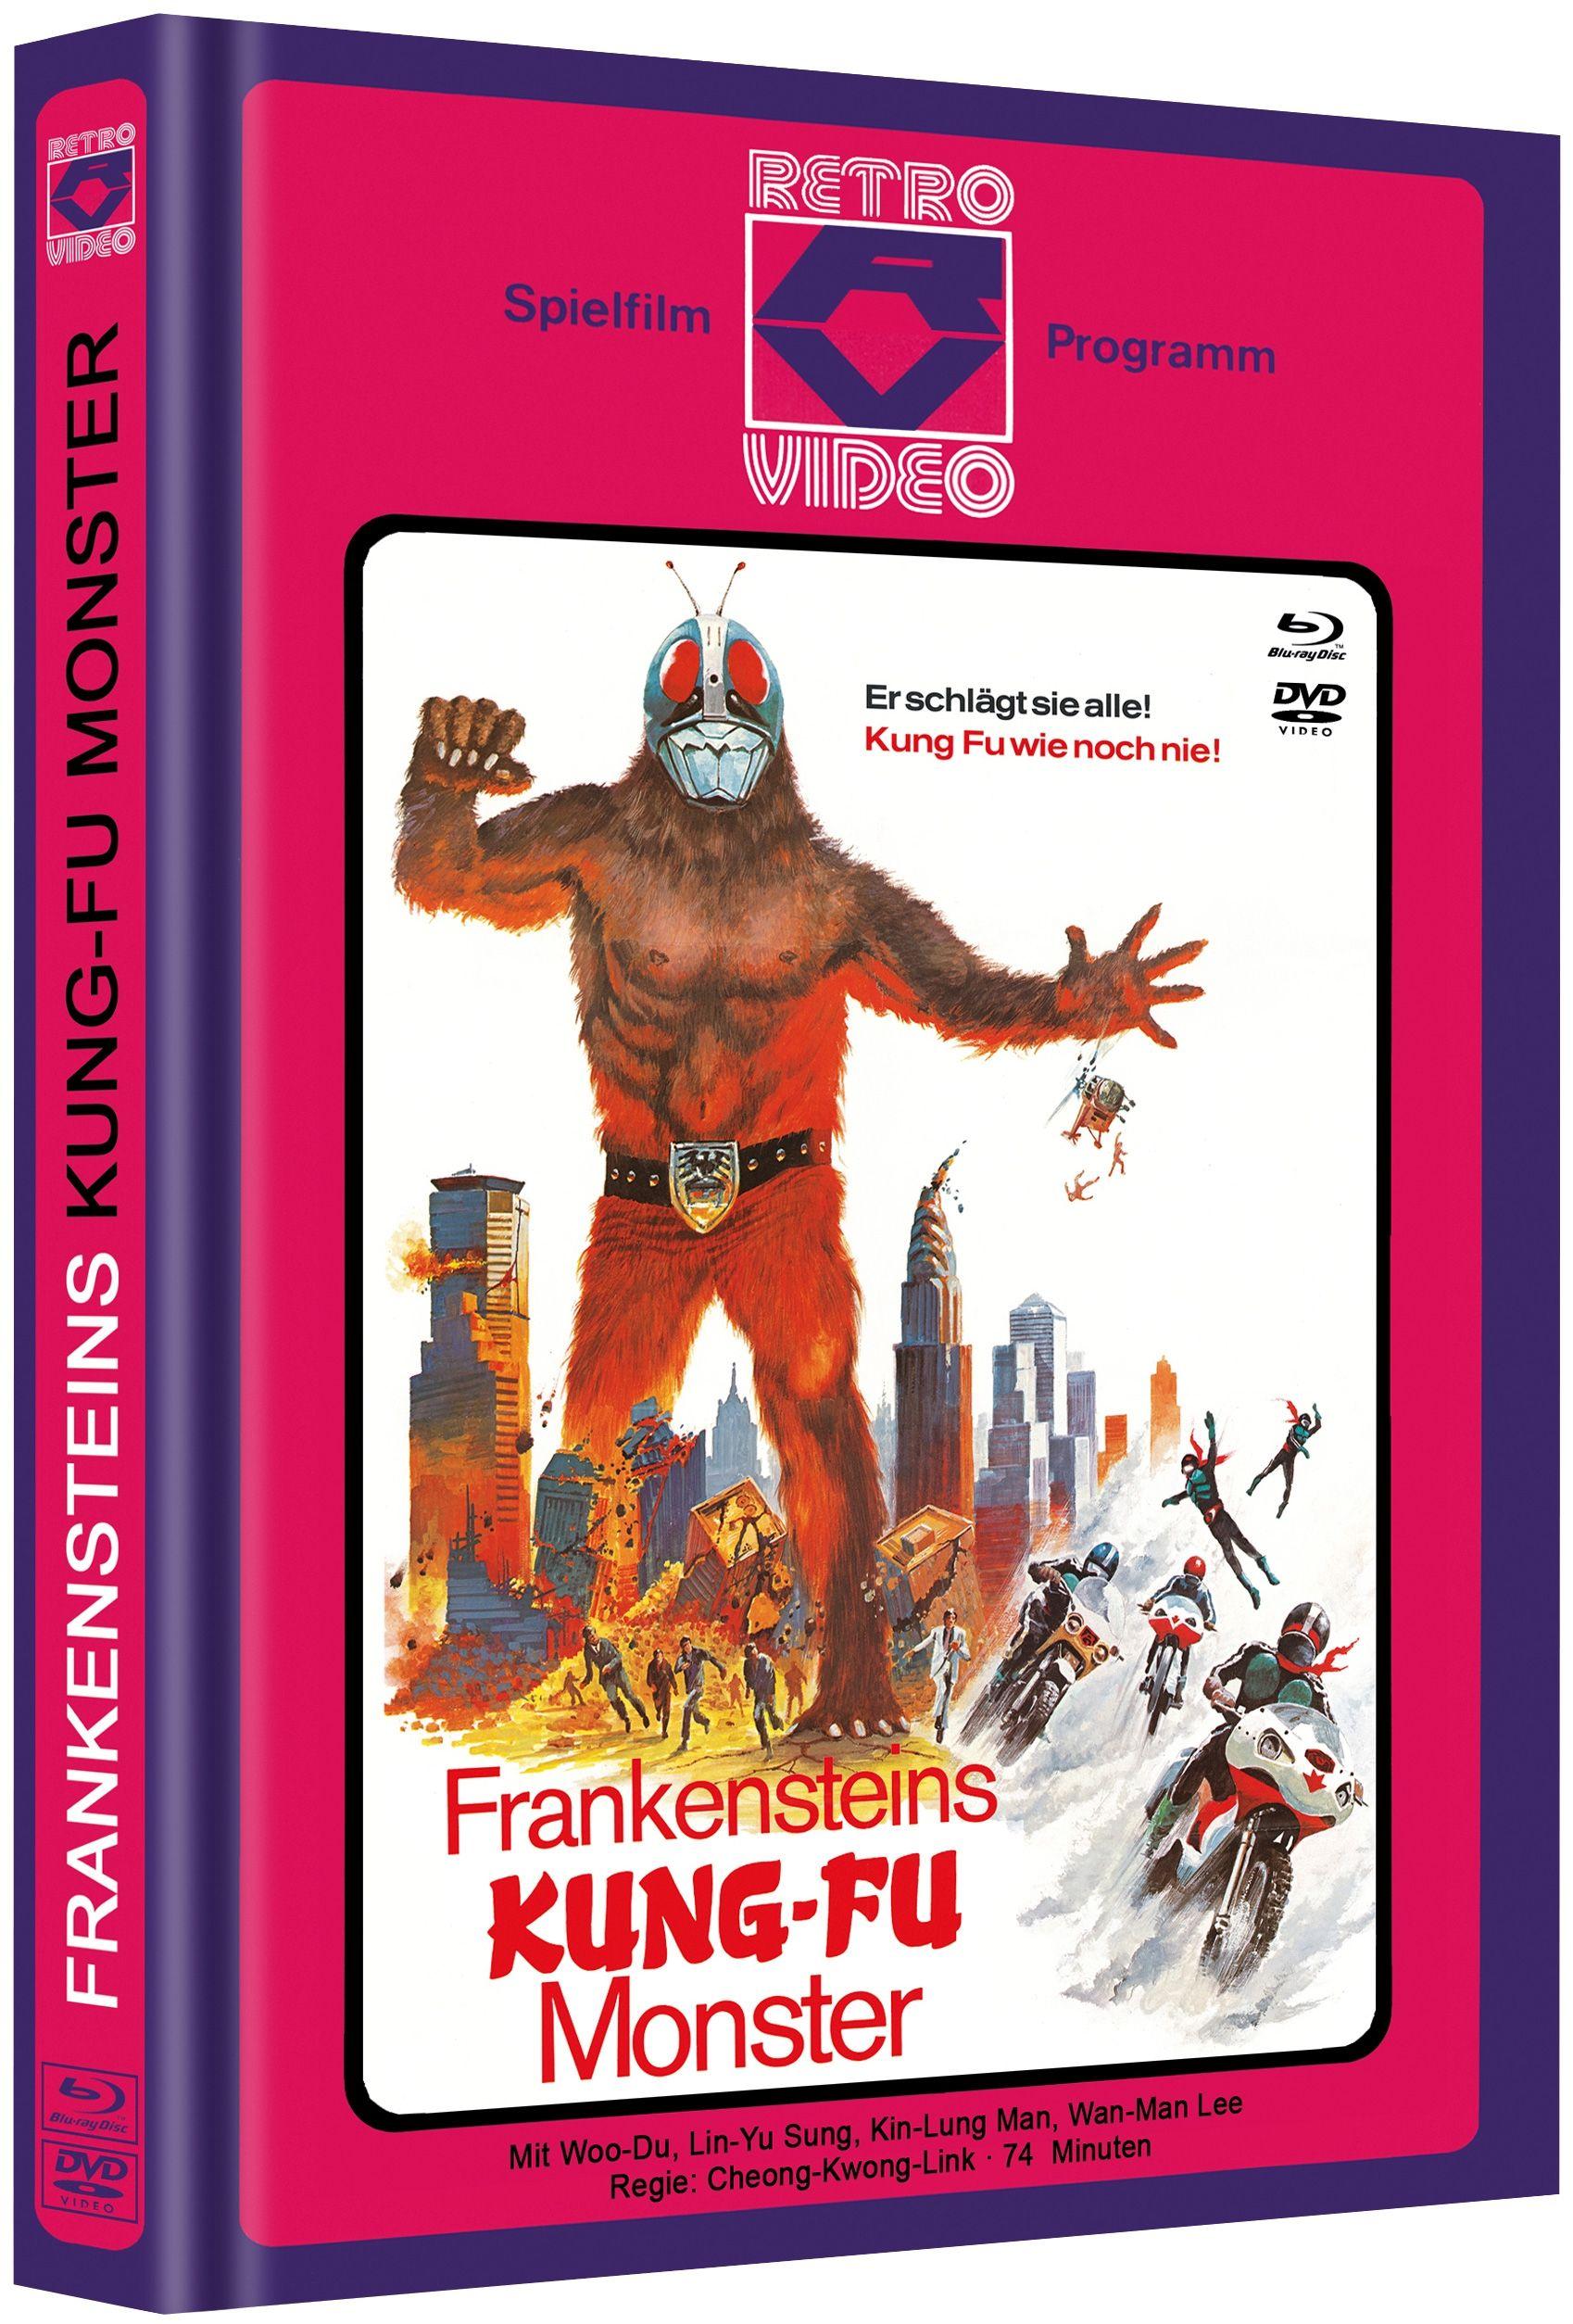 Frankensteins Kung-Fu Monster (Lim. Uncut Mediabook - Cover C) (DVD + BLURAY)